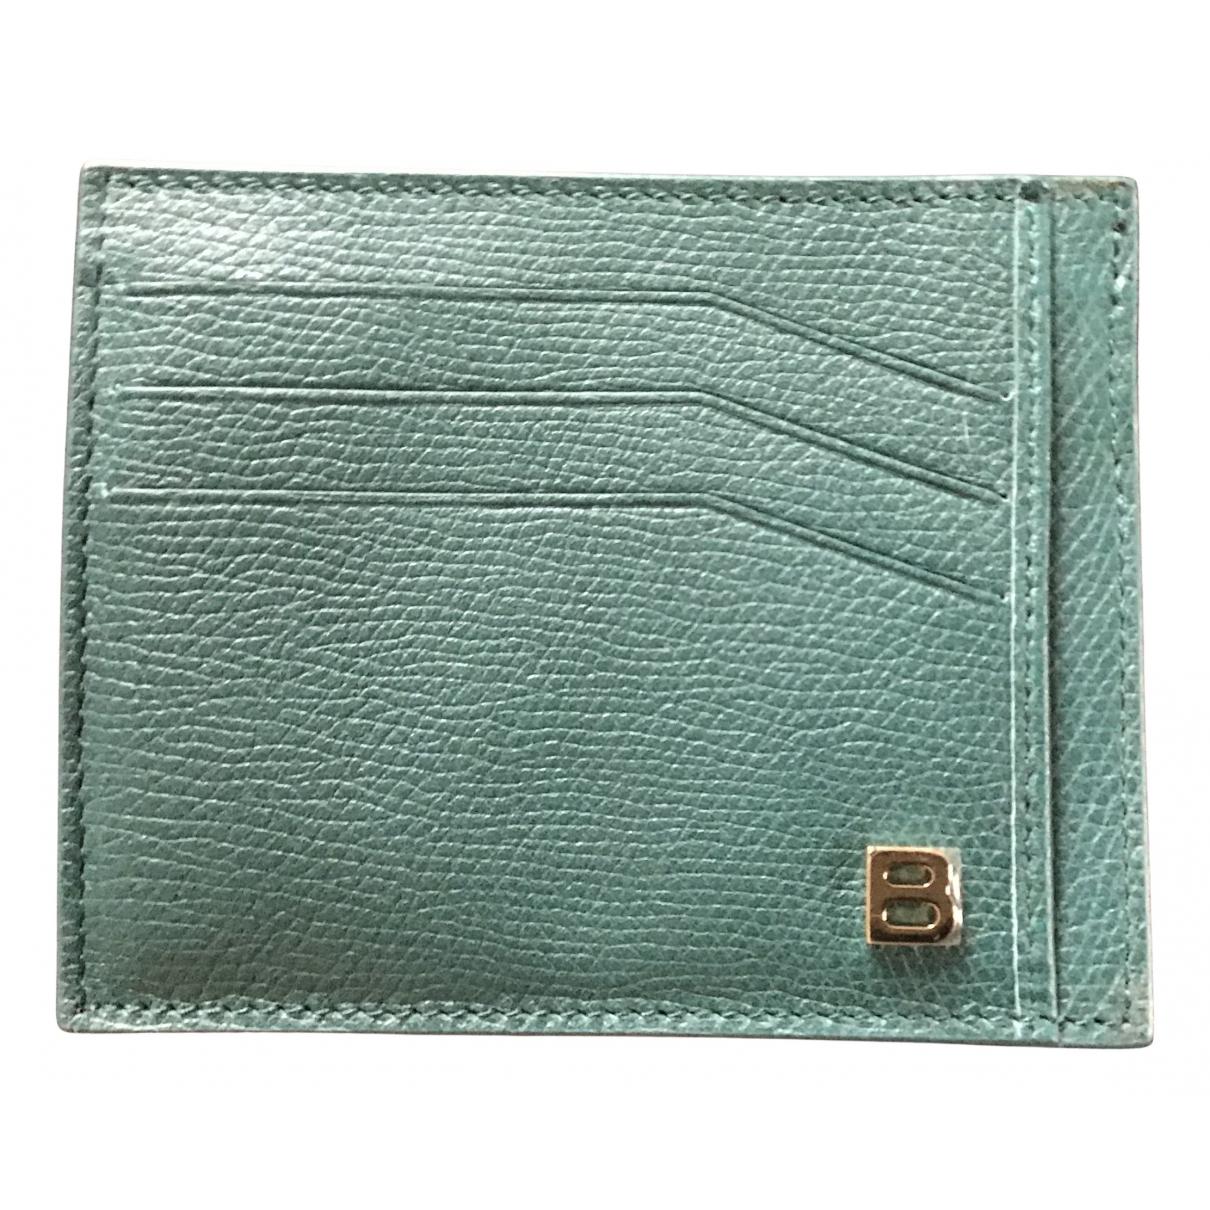 Balenciaga - Petite maroquinerie   pour homme en cuir - vert